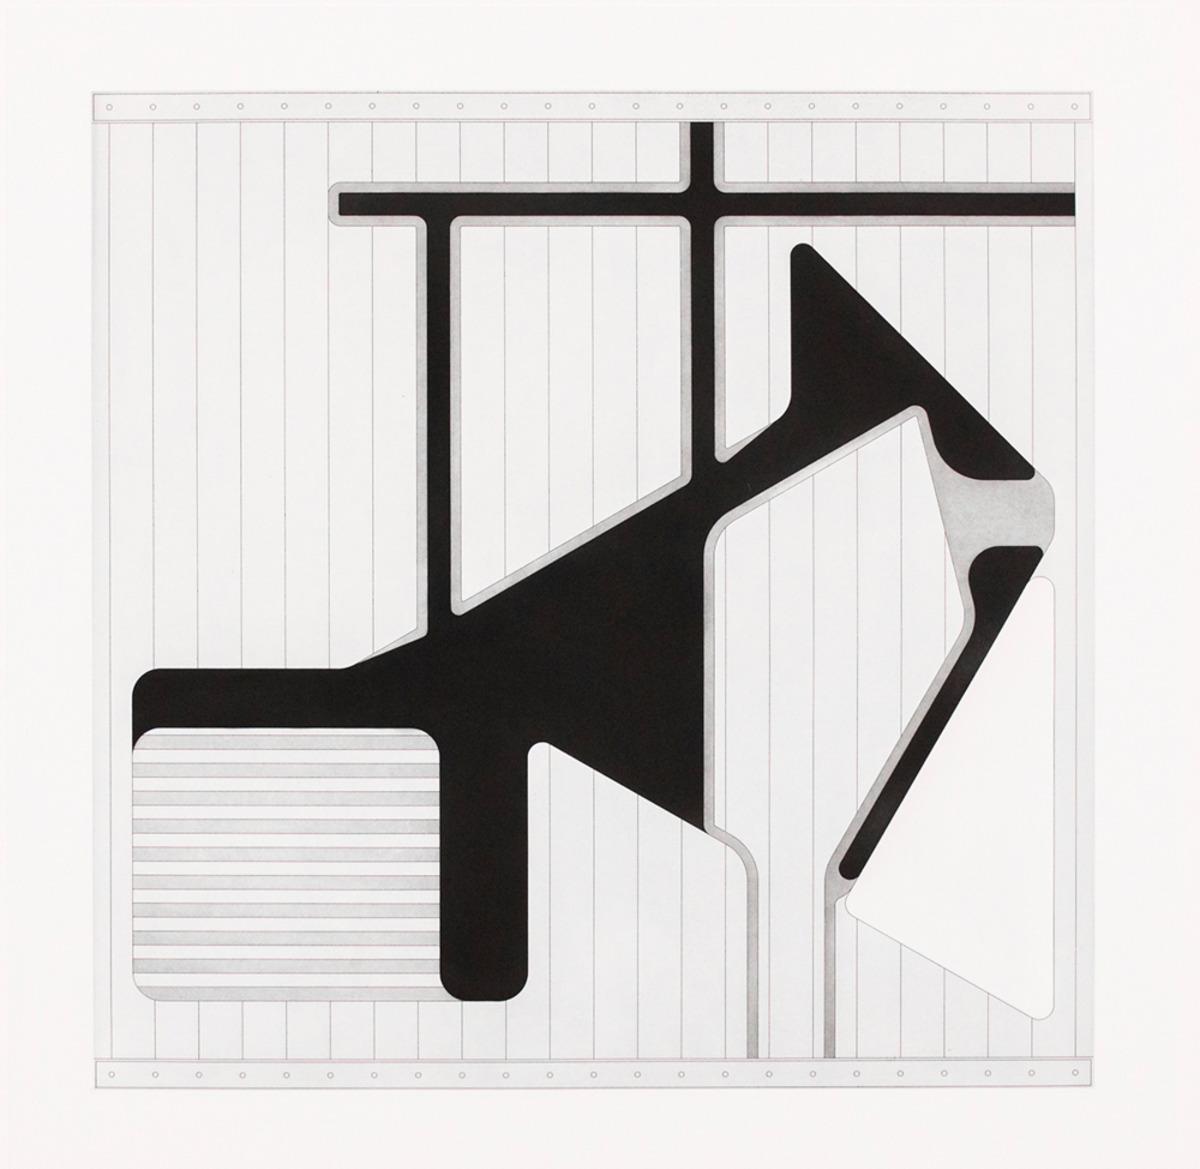 "Lemma III  ,  2015  Hard Ground Etching and Aquatint, Revere Silk 300gsm   Edition 21/25   27.5"" x 17.25""       Durham Press"